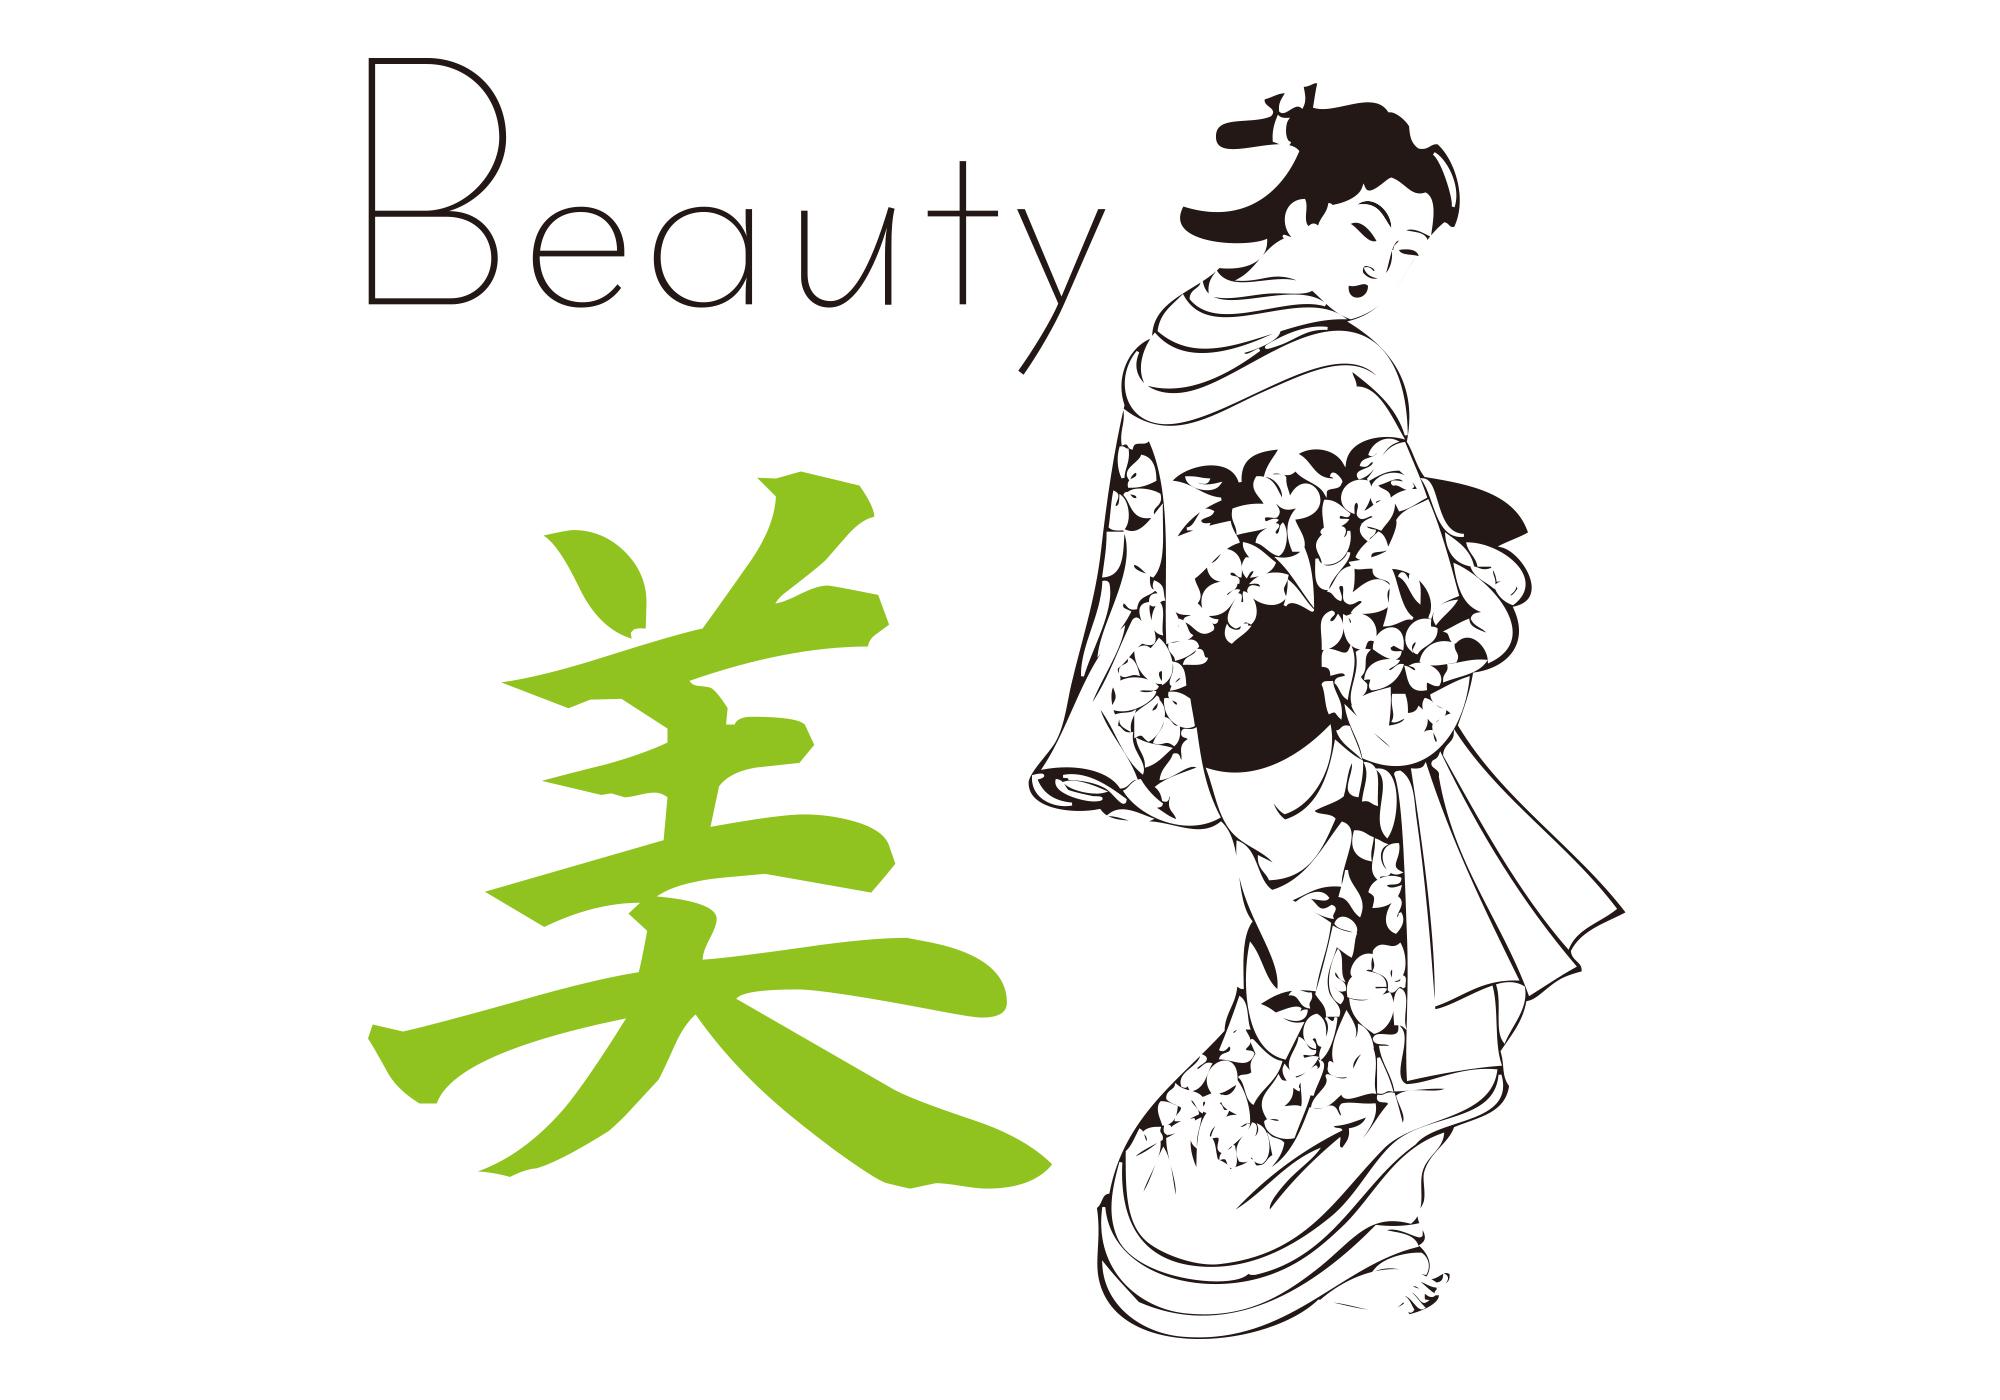 Beauty / 美 Cool Japanese KANJI All Design Art free Download